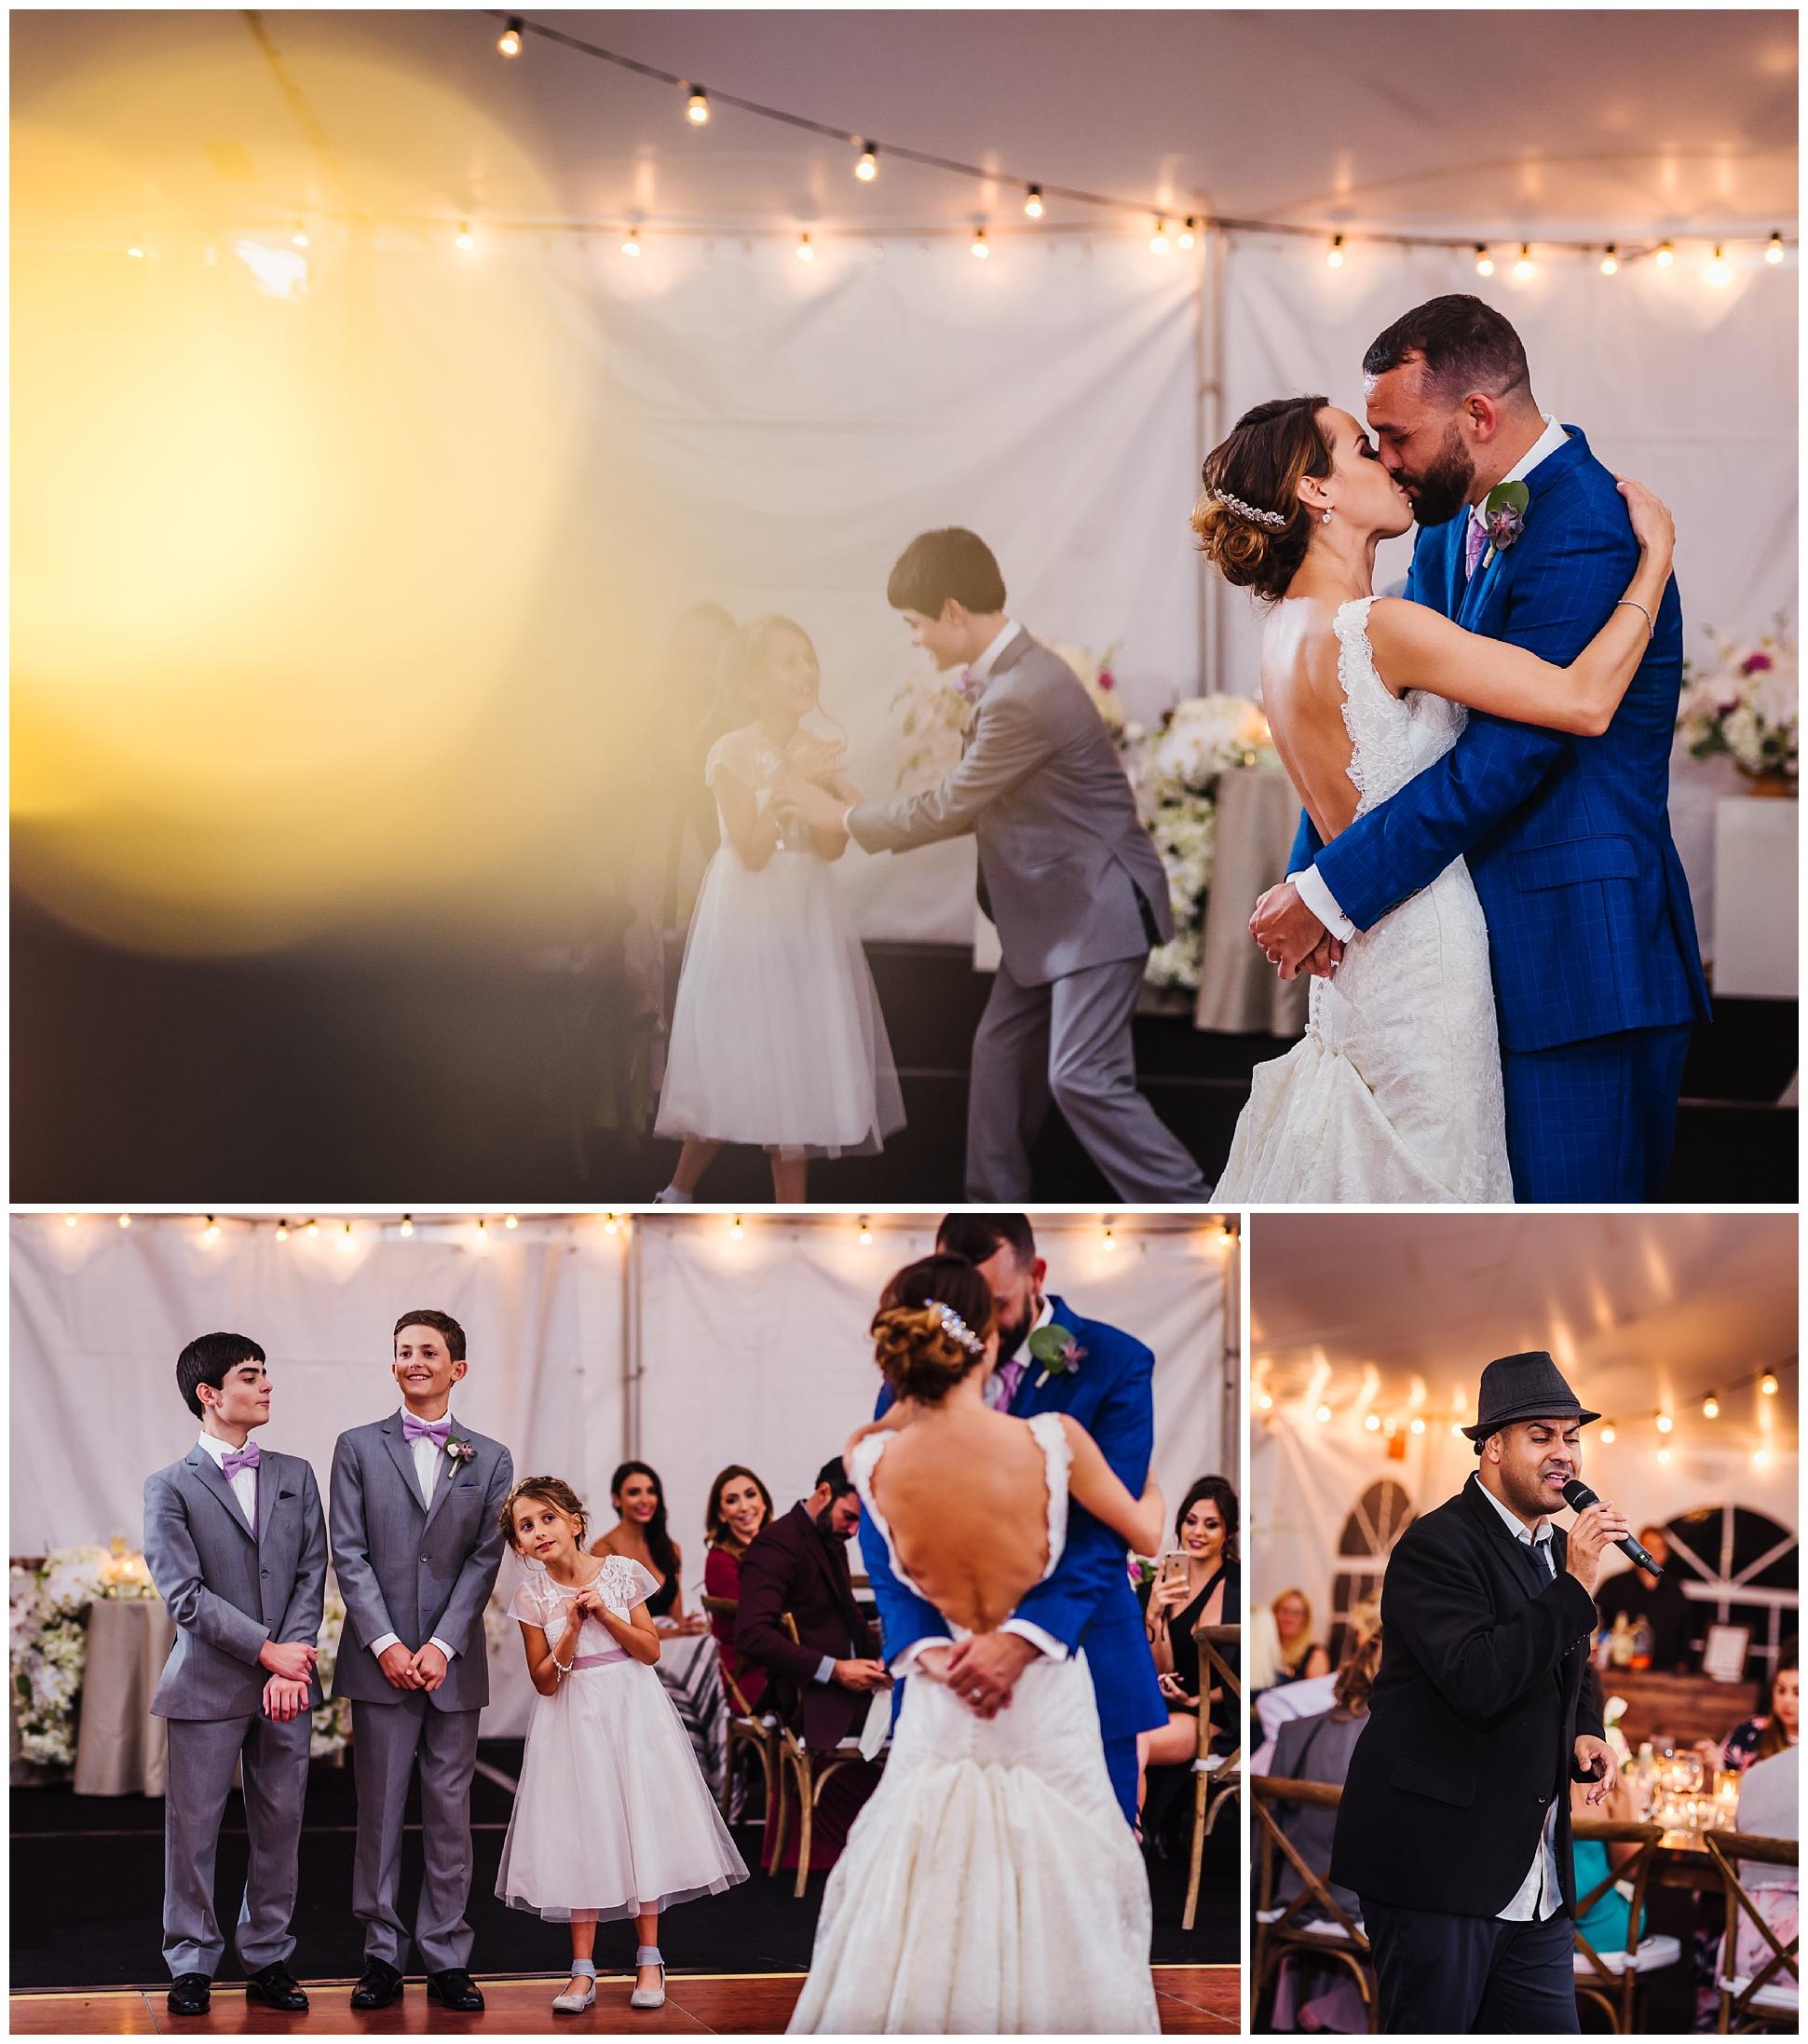 Tampa-luxury-wedding-photographer-mision-lago-private-estate_0052.jpg